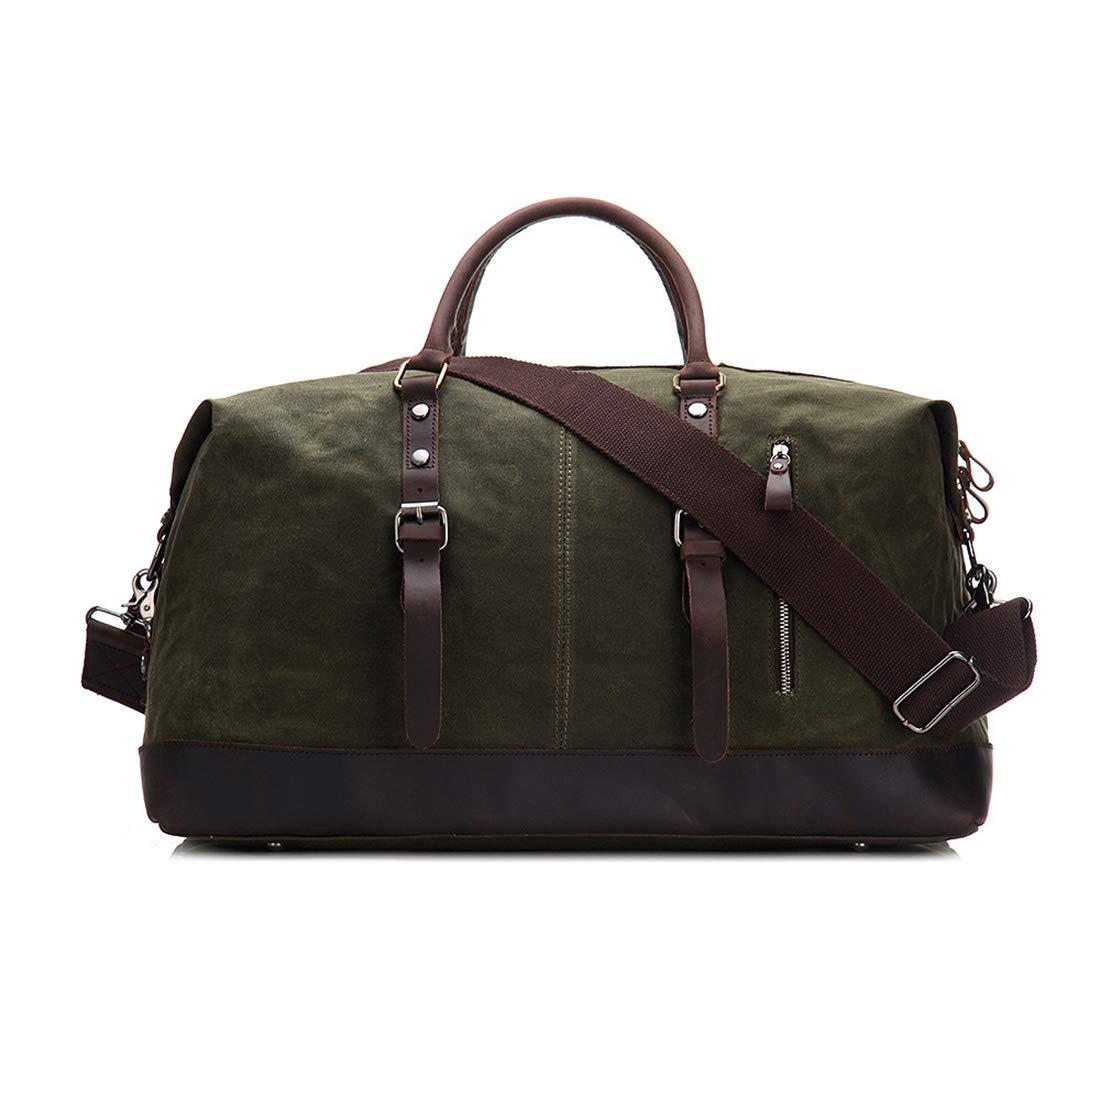 Aisiau fuku トラベルバッグ キャンバス旅行大容量ハンドバッグシングルショルダークロス多機能荷物バッグ男女兼用 軽量 折りたたみ 旅行 機内持ち (色 : アーミーグリーン) B07TG2BY7D アーミーグリーン